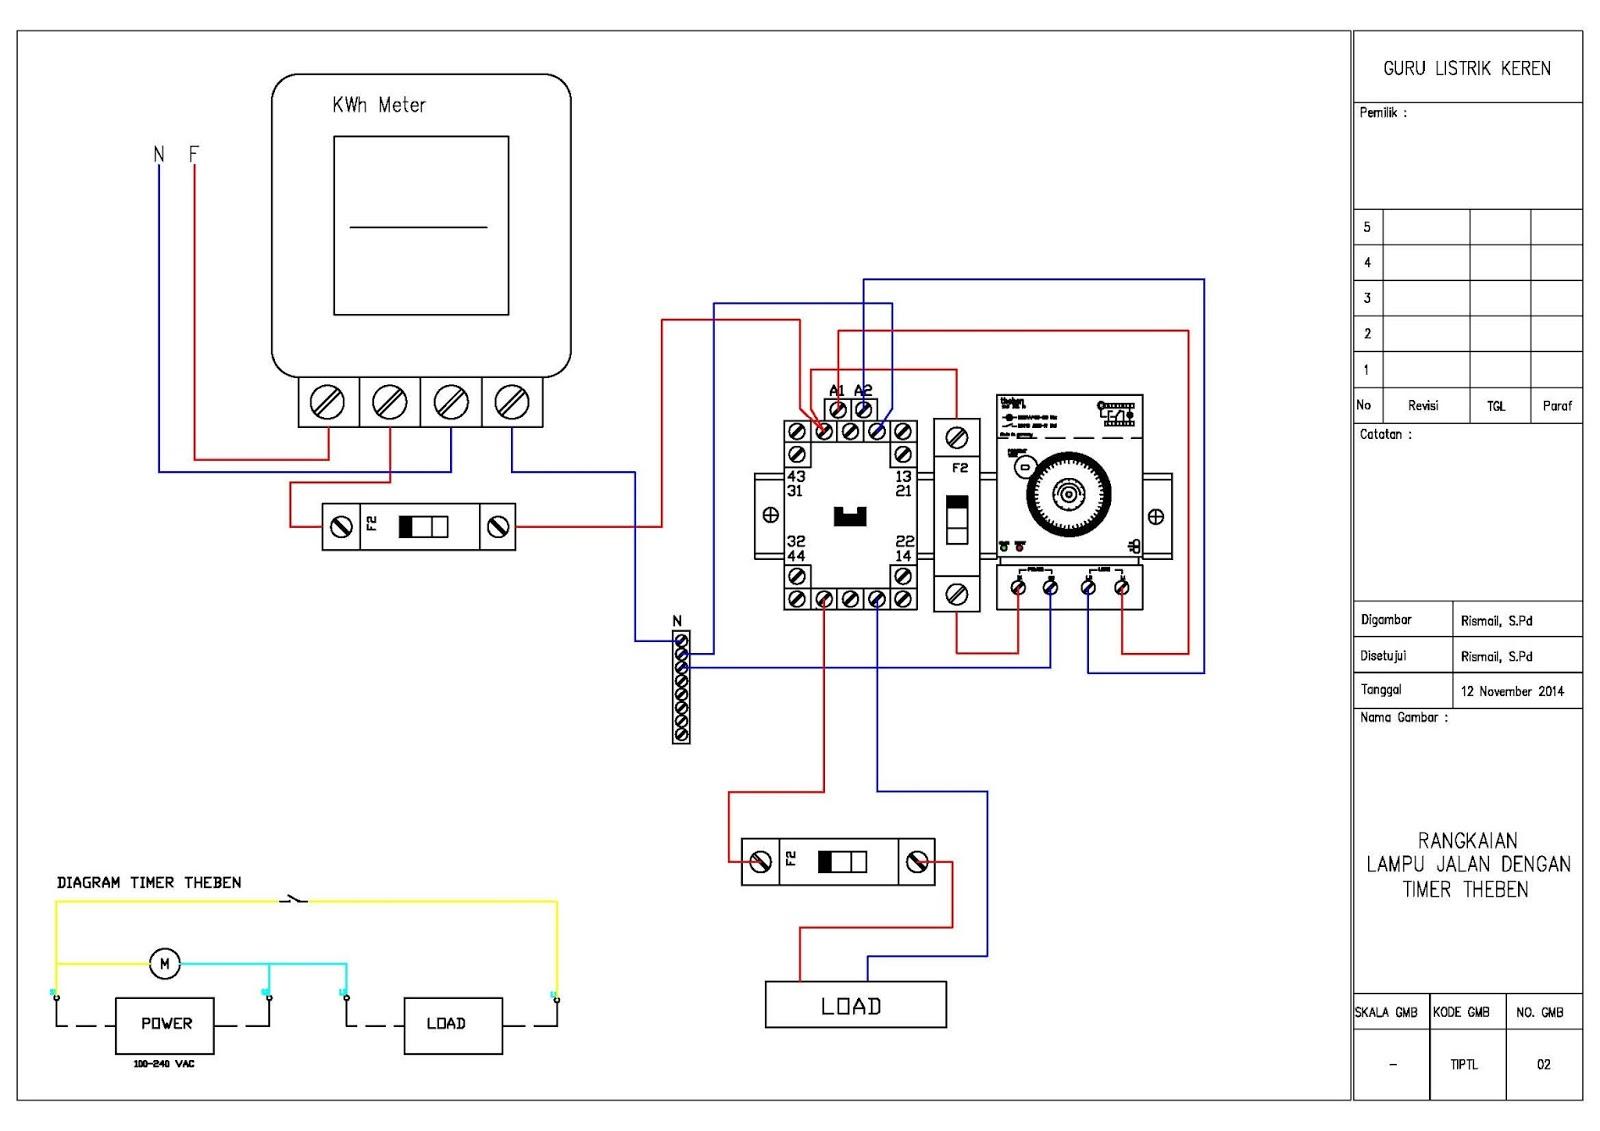 rangkaian timer theben guru listrik keren wiring diagram lampu dengan timer rangkaian theben untuk lampu [ 1600 x 1131 Pixel ]